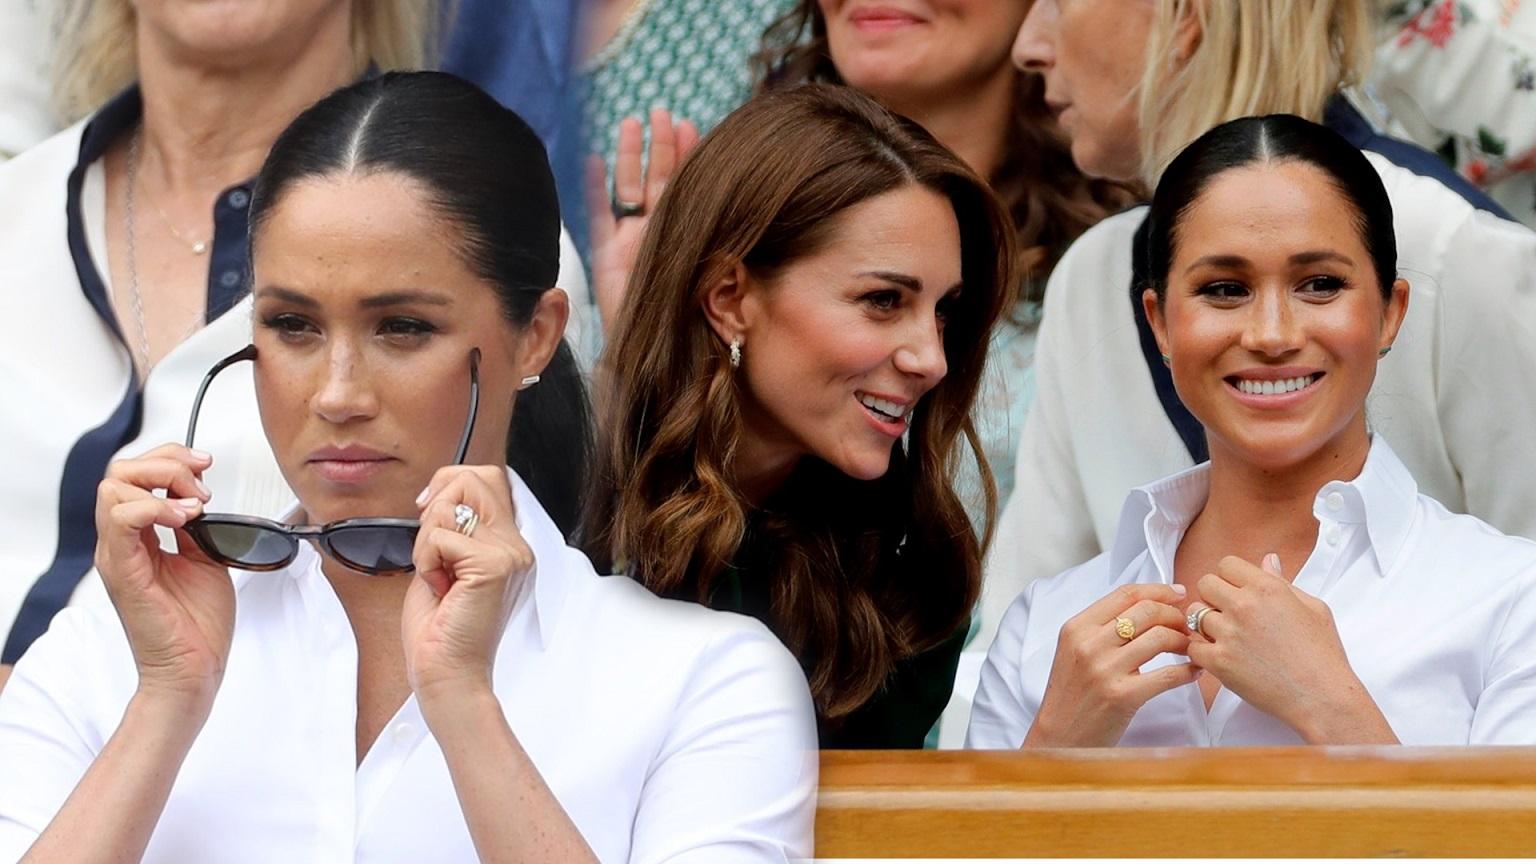 Dlaczego Meghan Markle opuściła szybciej Wimbledon niż księżna Kate?